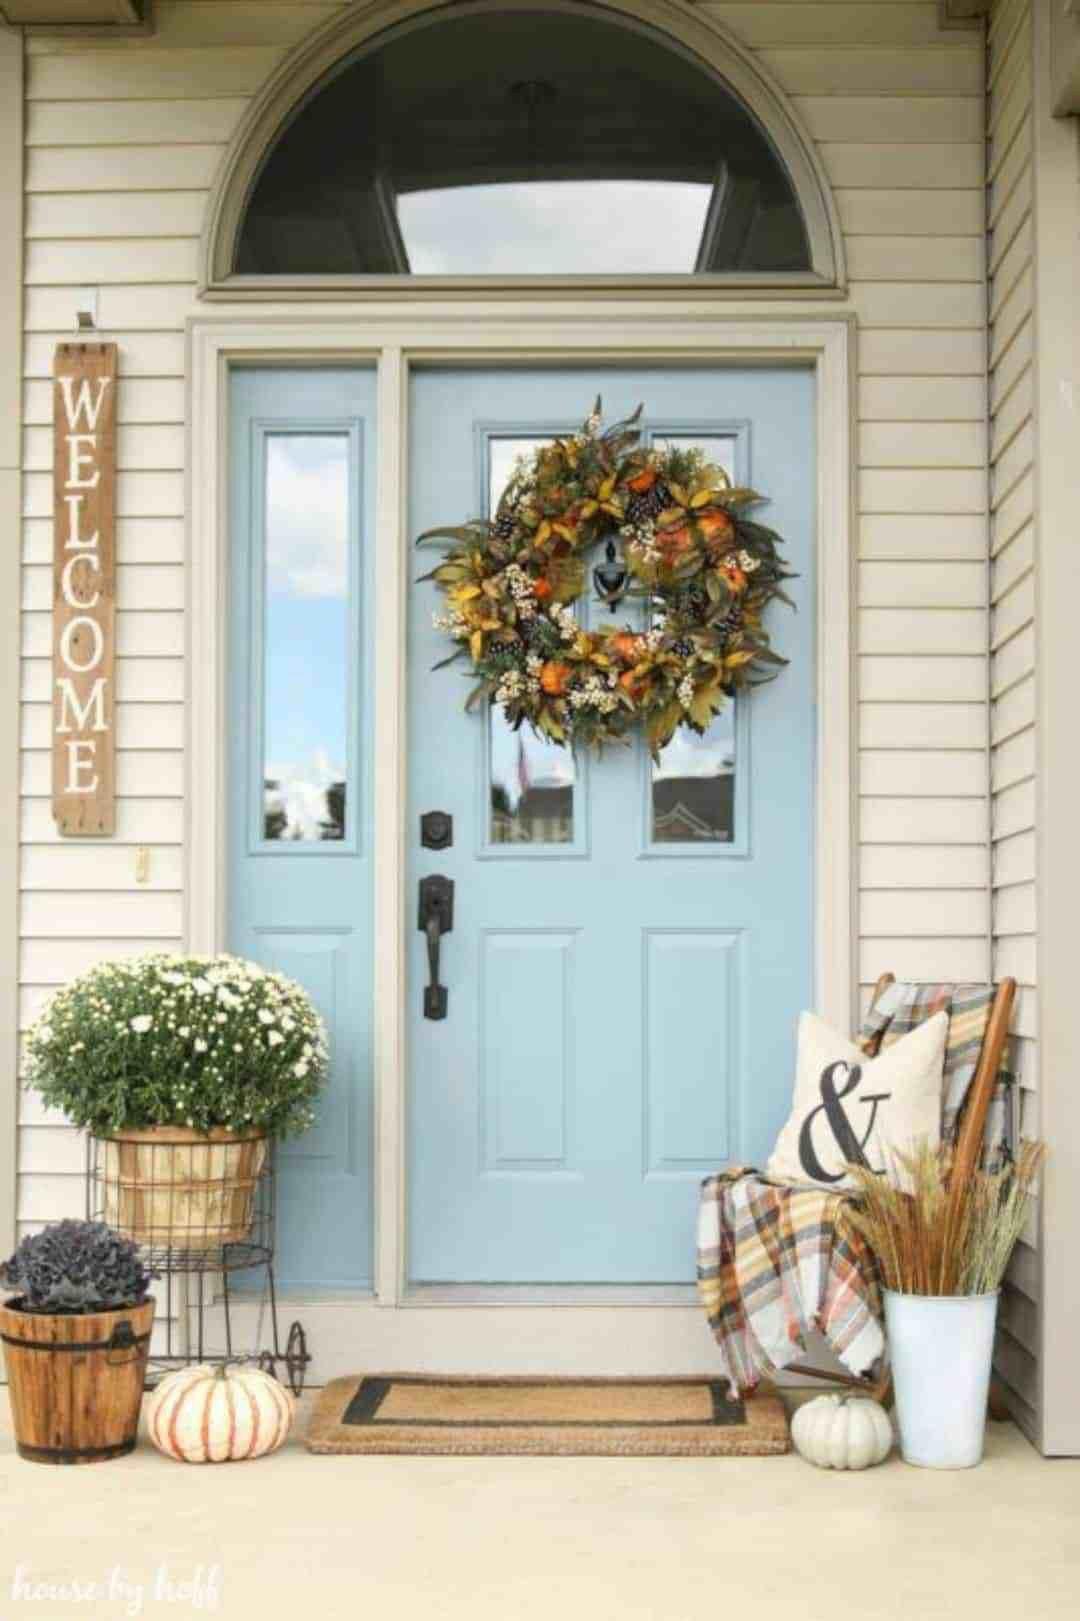 Decor Ideas for Front Porch Best Of 17 Impressive Front Porch Decorating Ideas Futurist